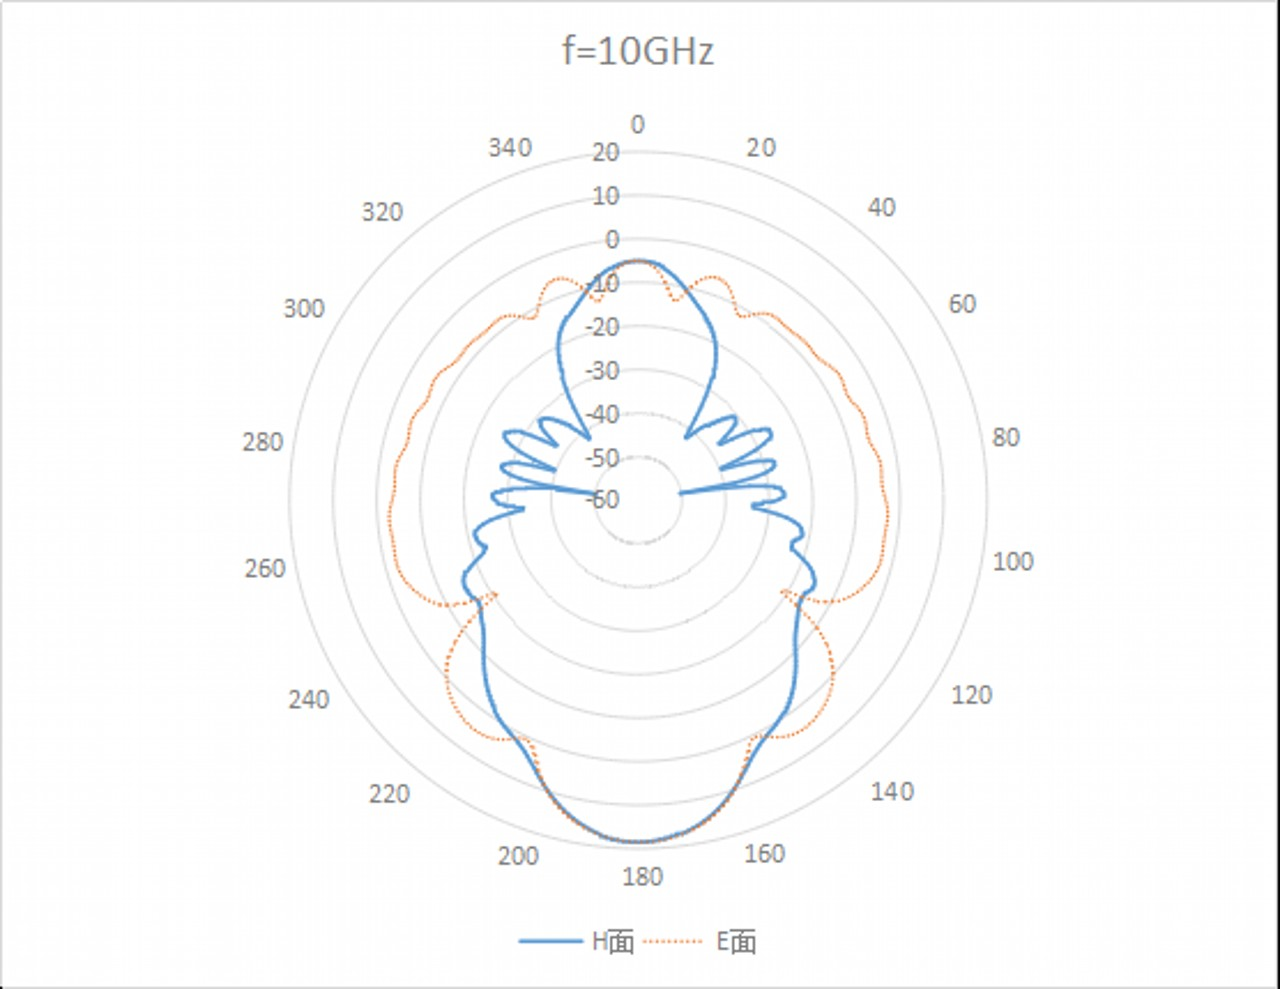 WR-112 Waveguide Standard Gain Horn Antenna. Nominal Gain: 15 dBi Gain. Frequency Range: 7.5 GHz to 10 GHz - 2